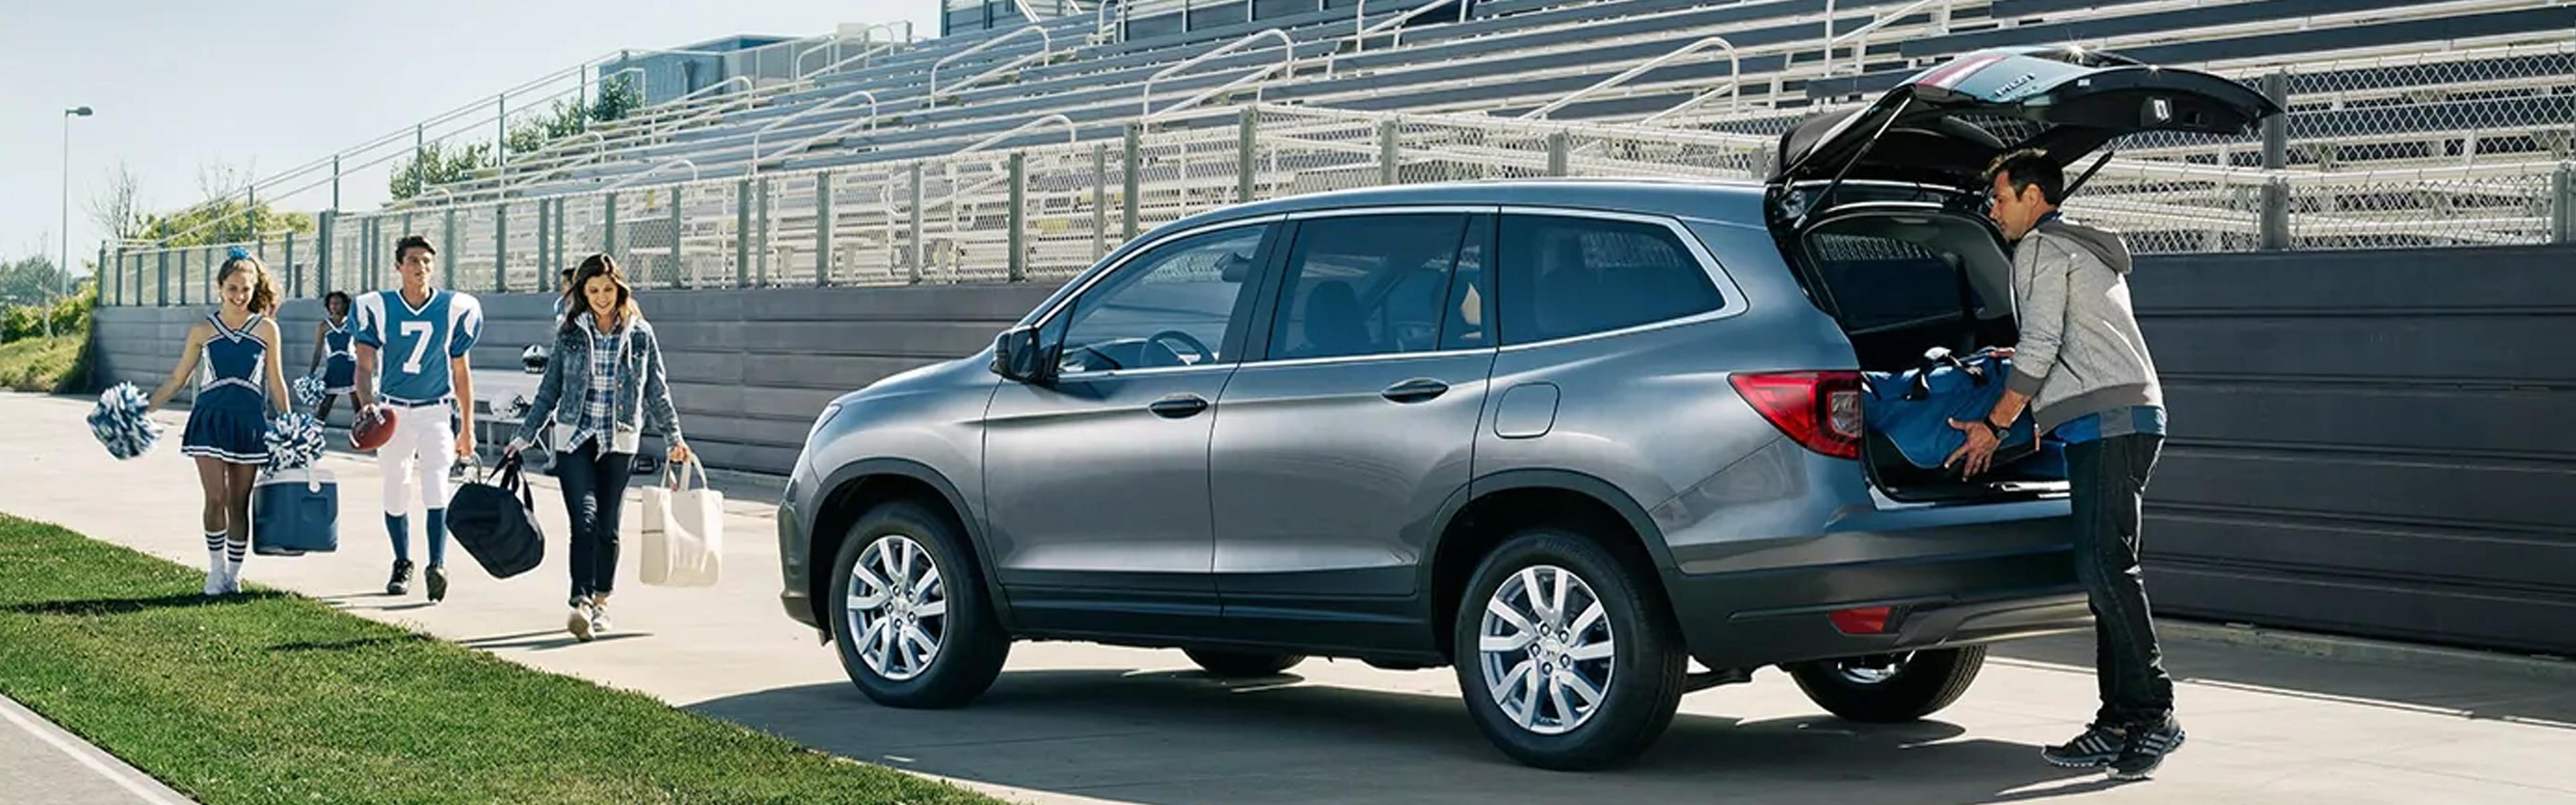 2020 Honda Pilot SUVs For Sale In New Glasgow, Nova Scotia